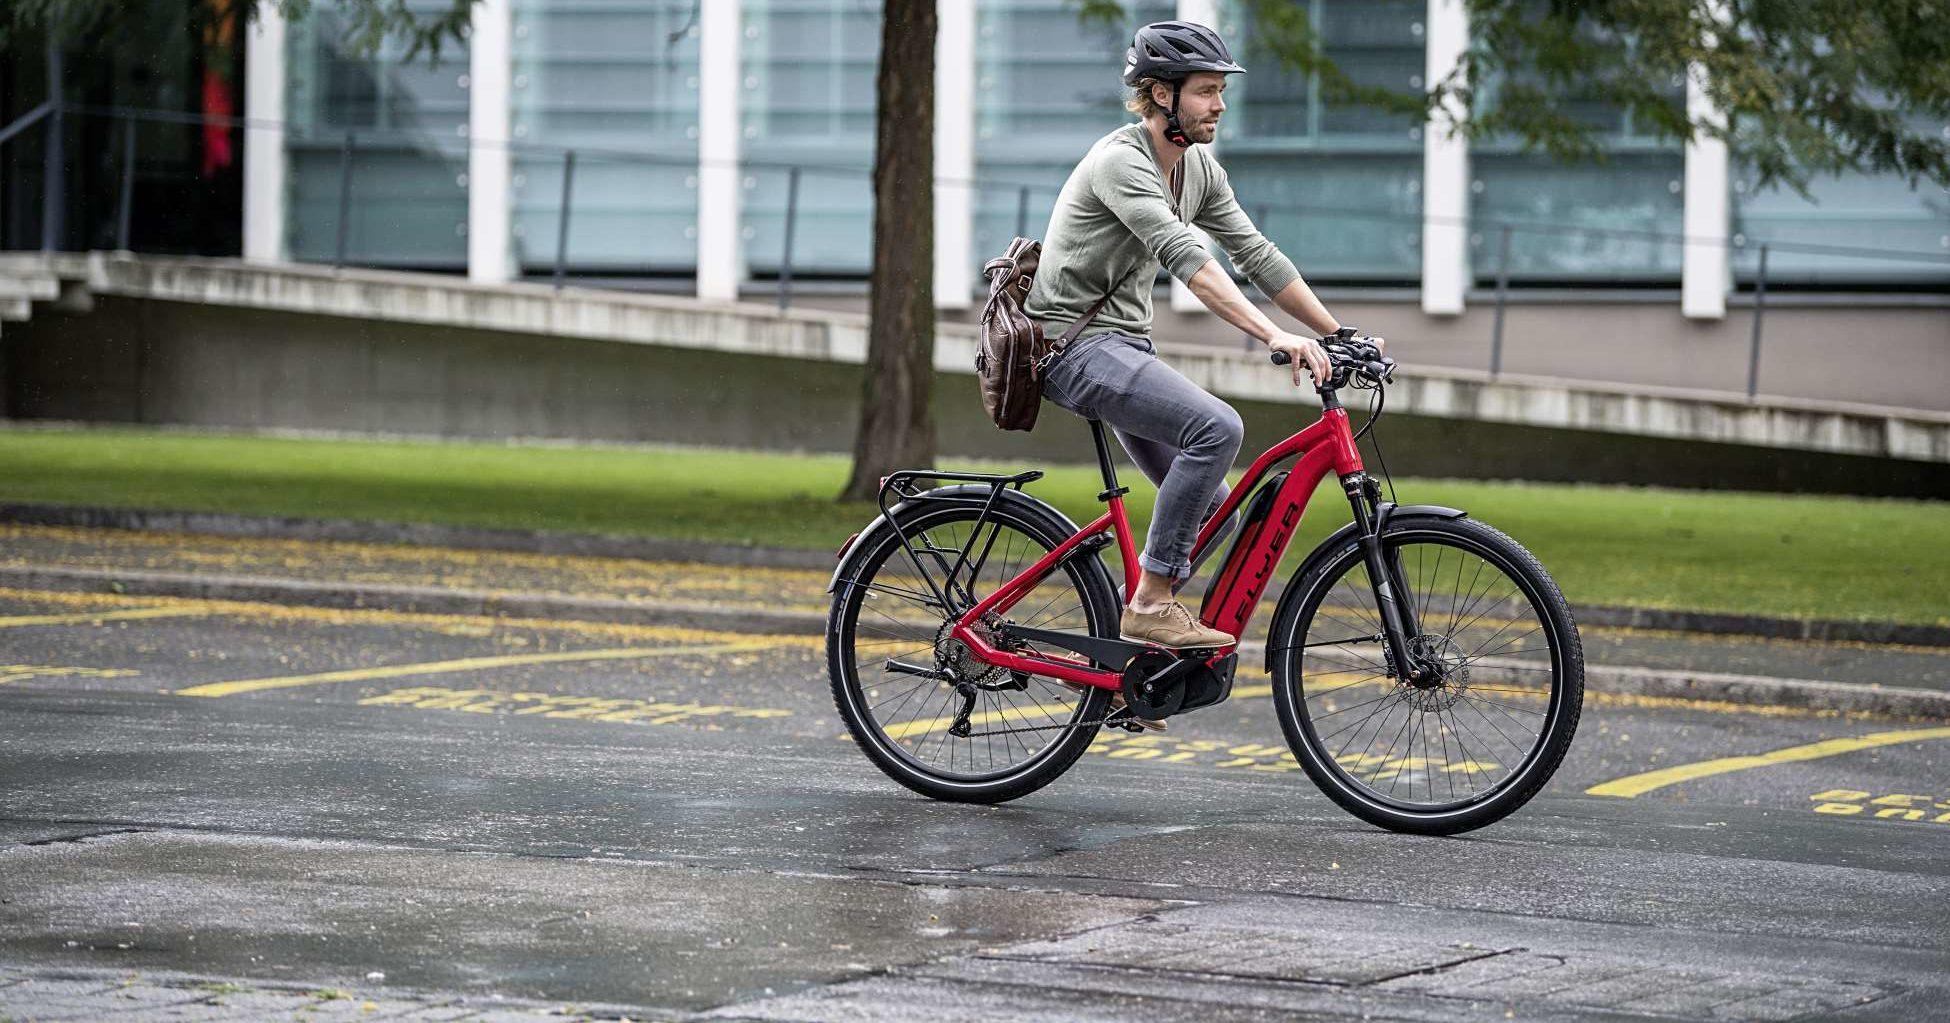 e-citybikes gebraucht kaufen bei used-ebike.com